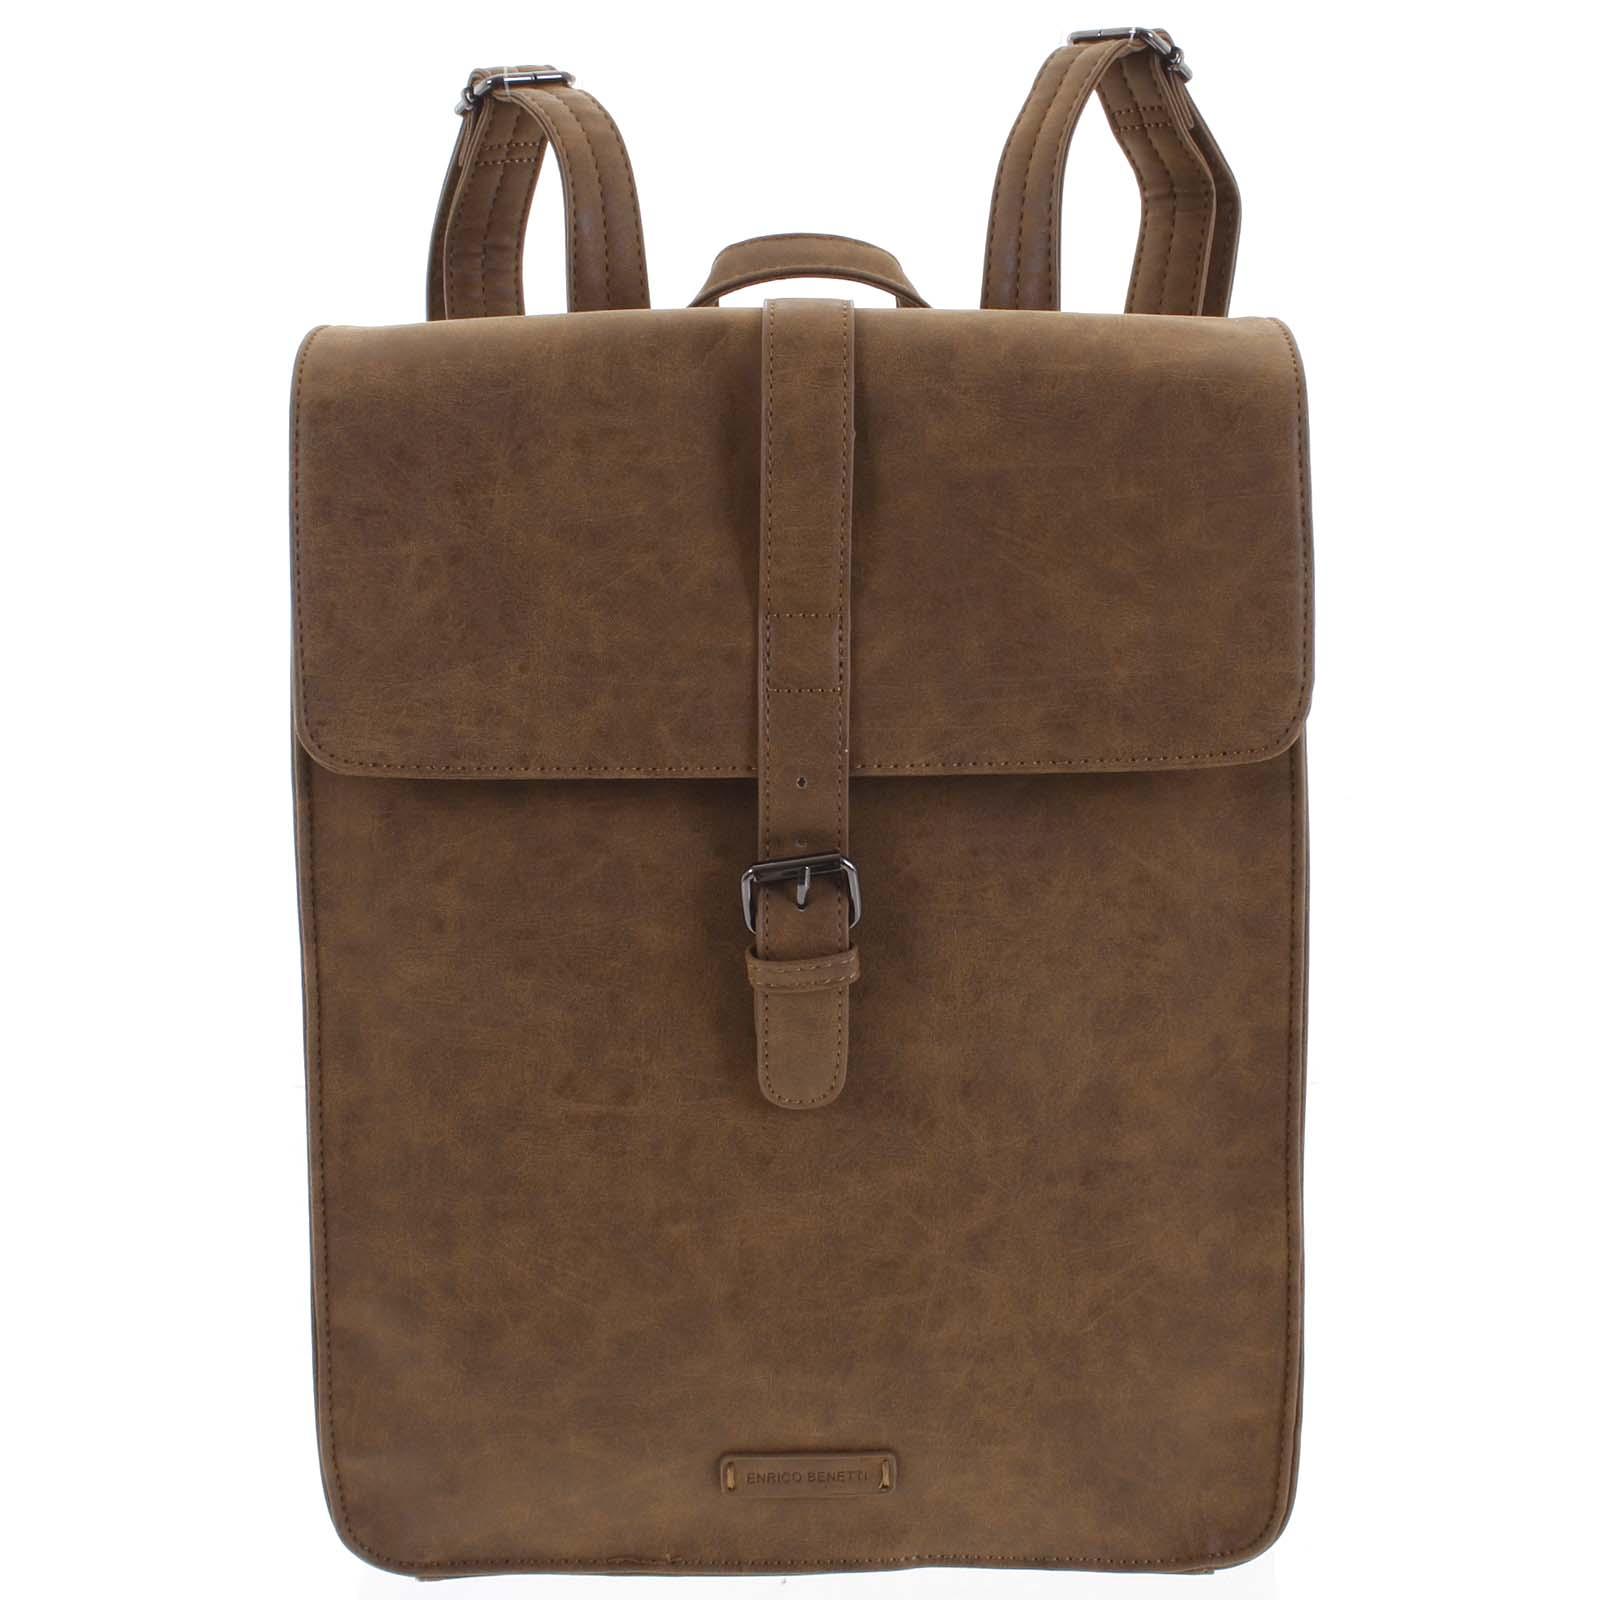 Stylový batoh camel - Enrico Benetti Darlo